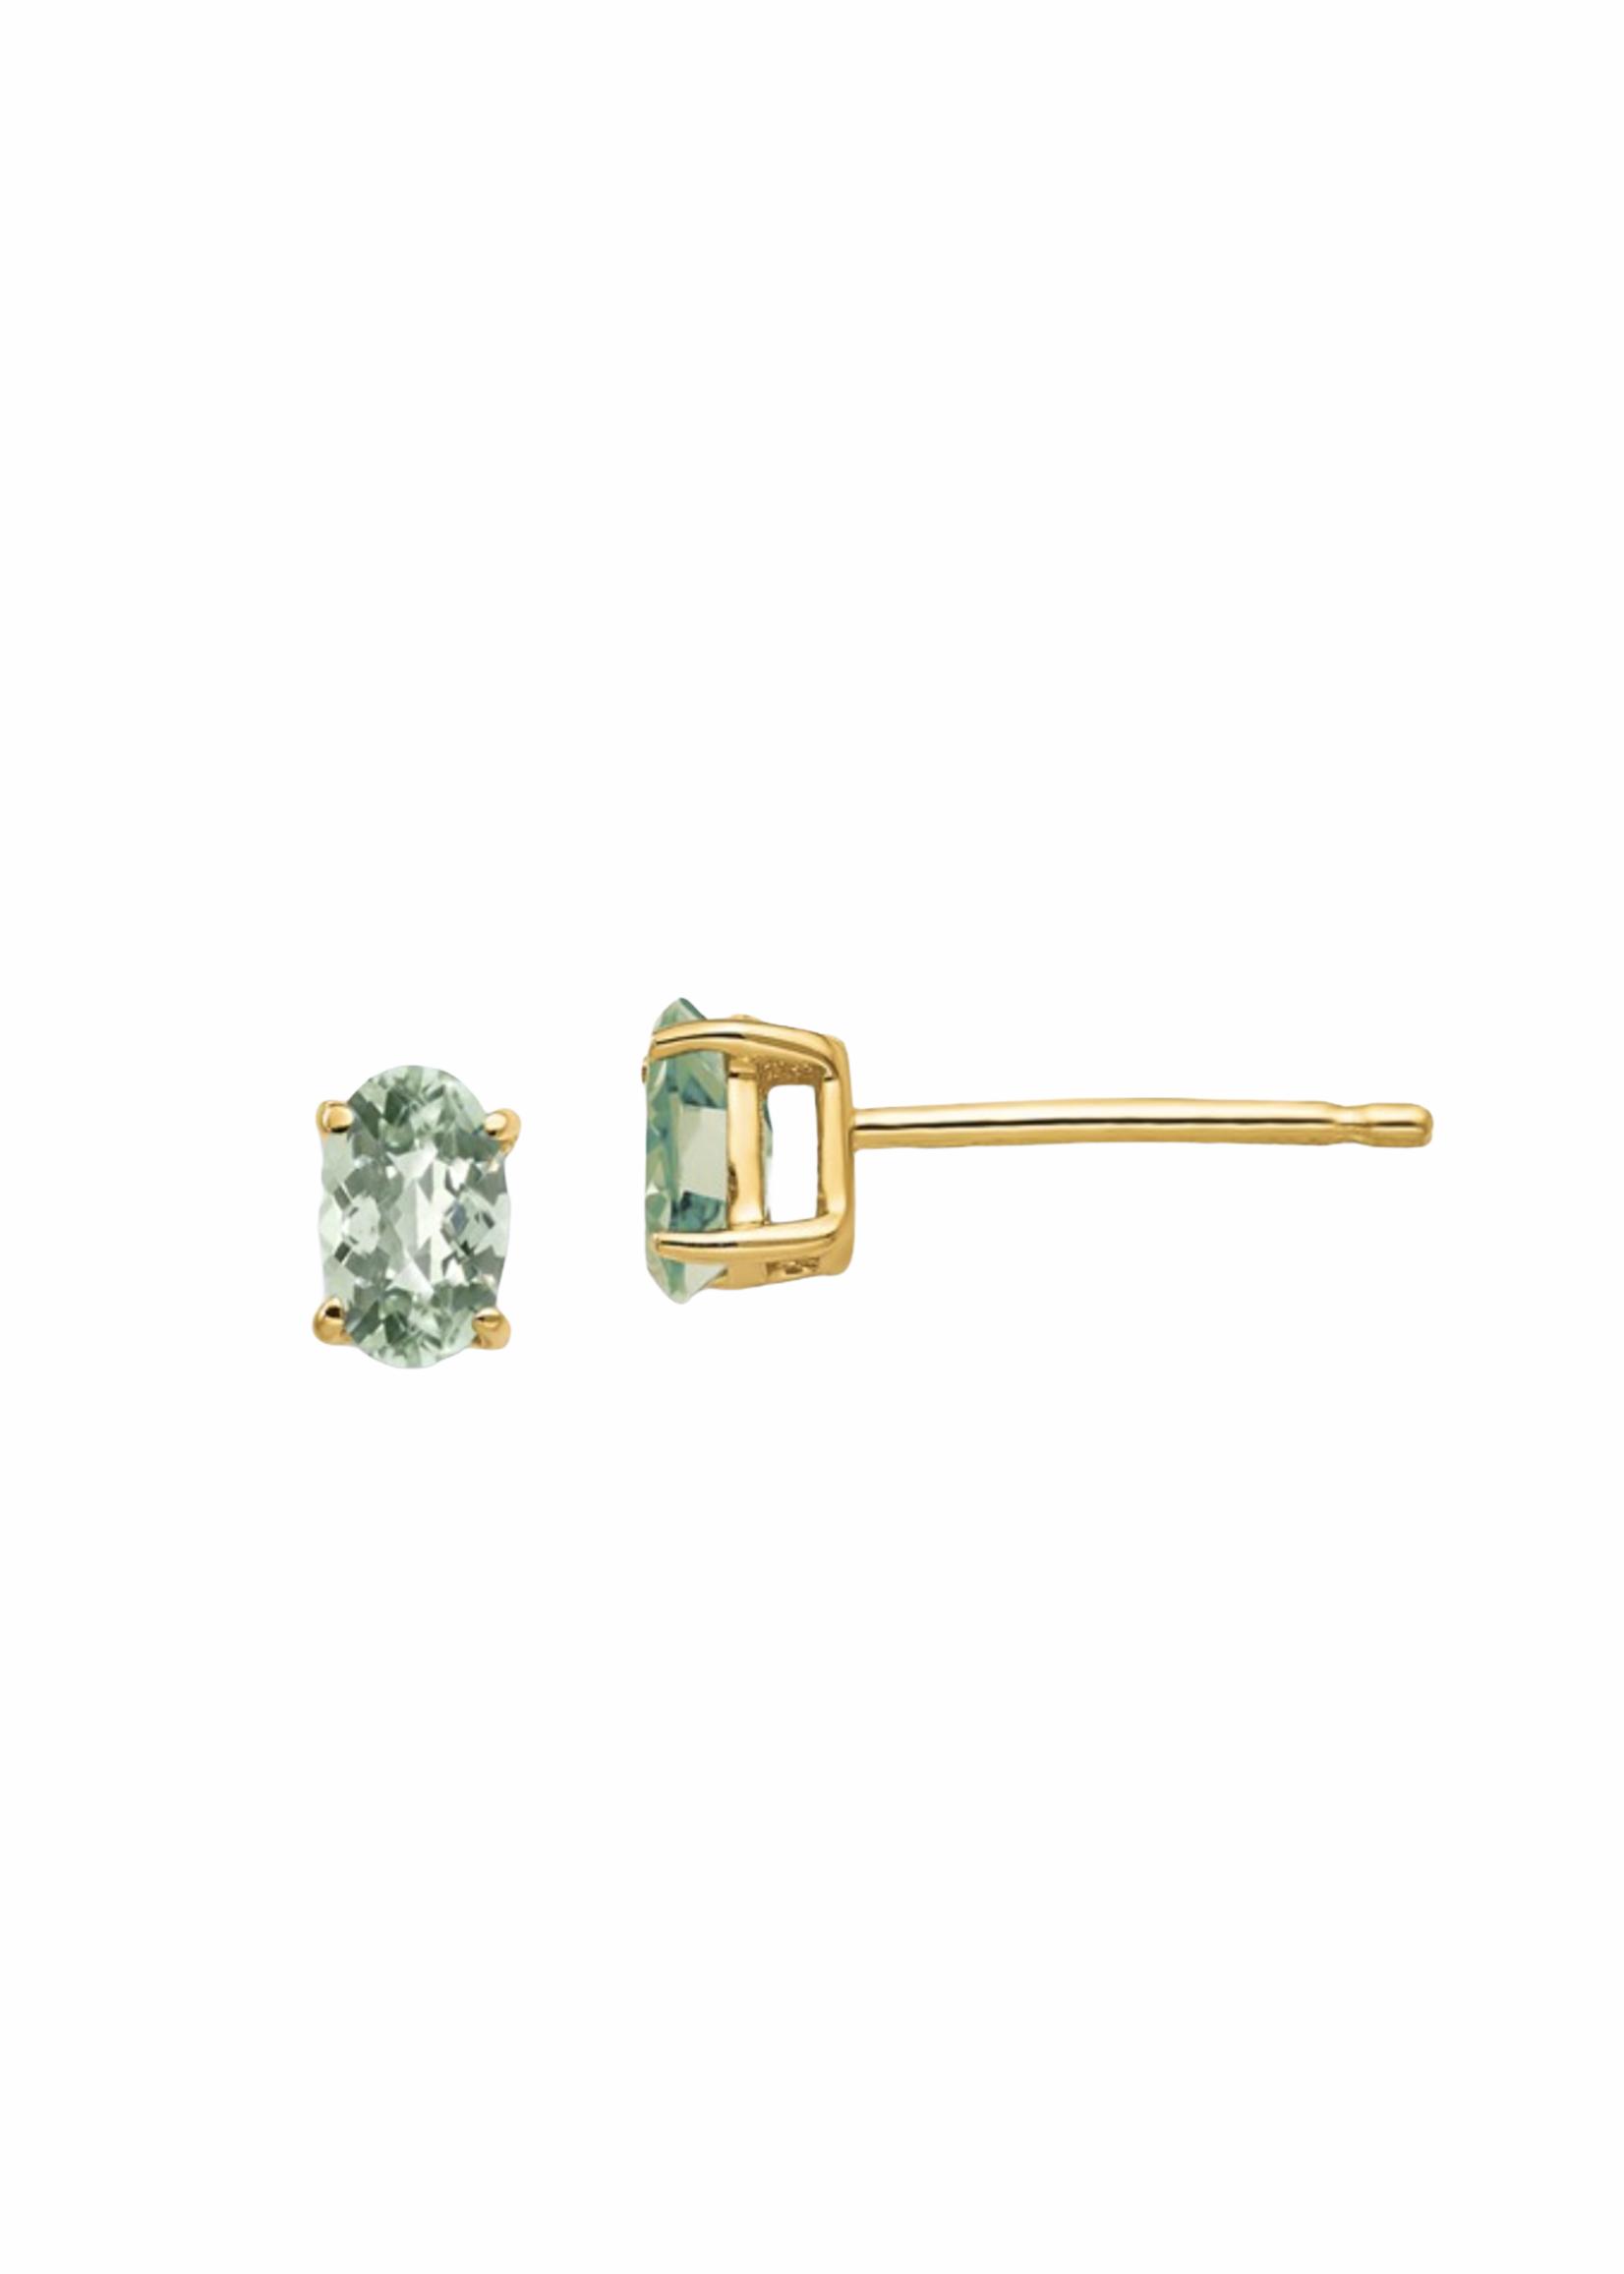 Jill Alberts Green Quartz Earrings